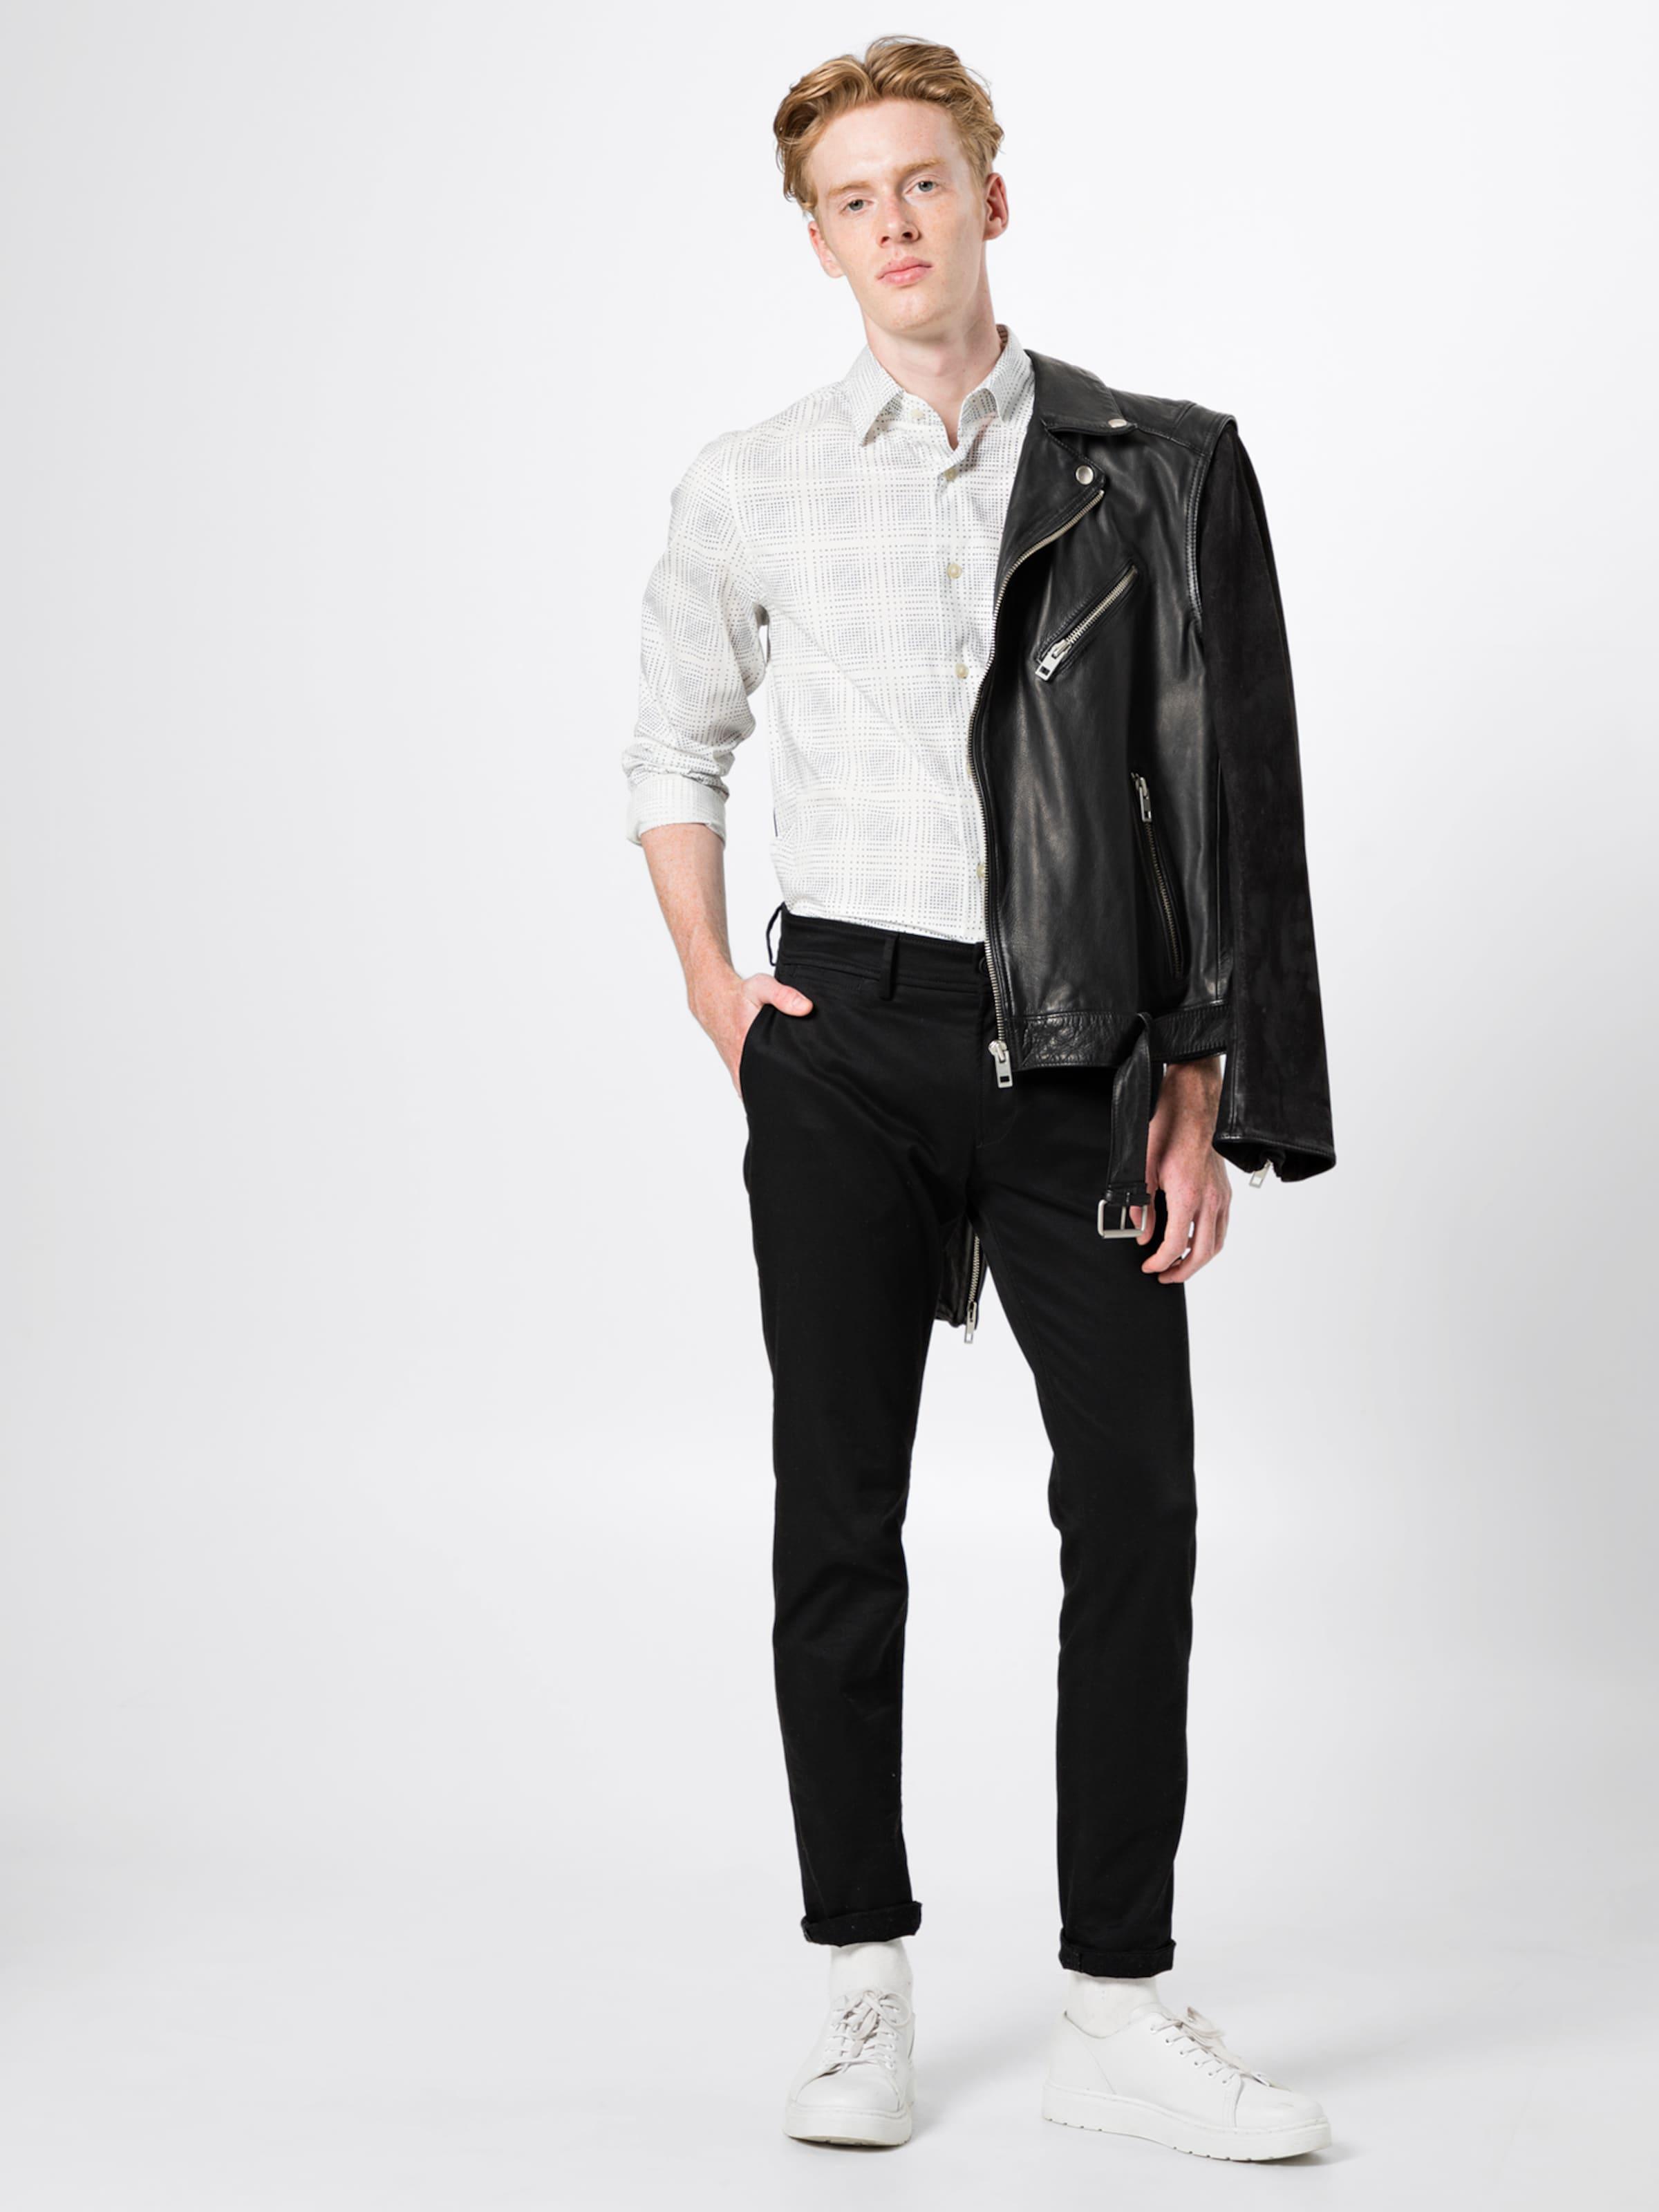 CremeDunkelblau Super In 'core G Shirt s' Slim Hemd L star Raw IE9WDYH2